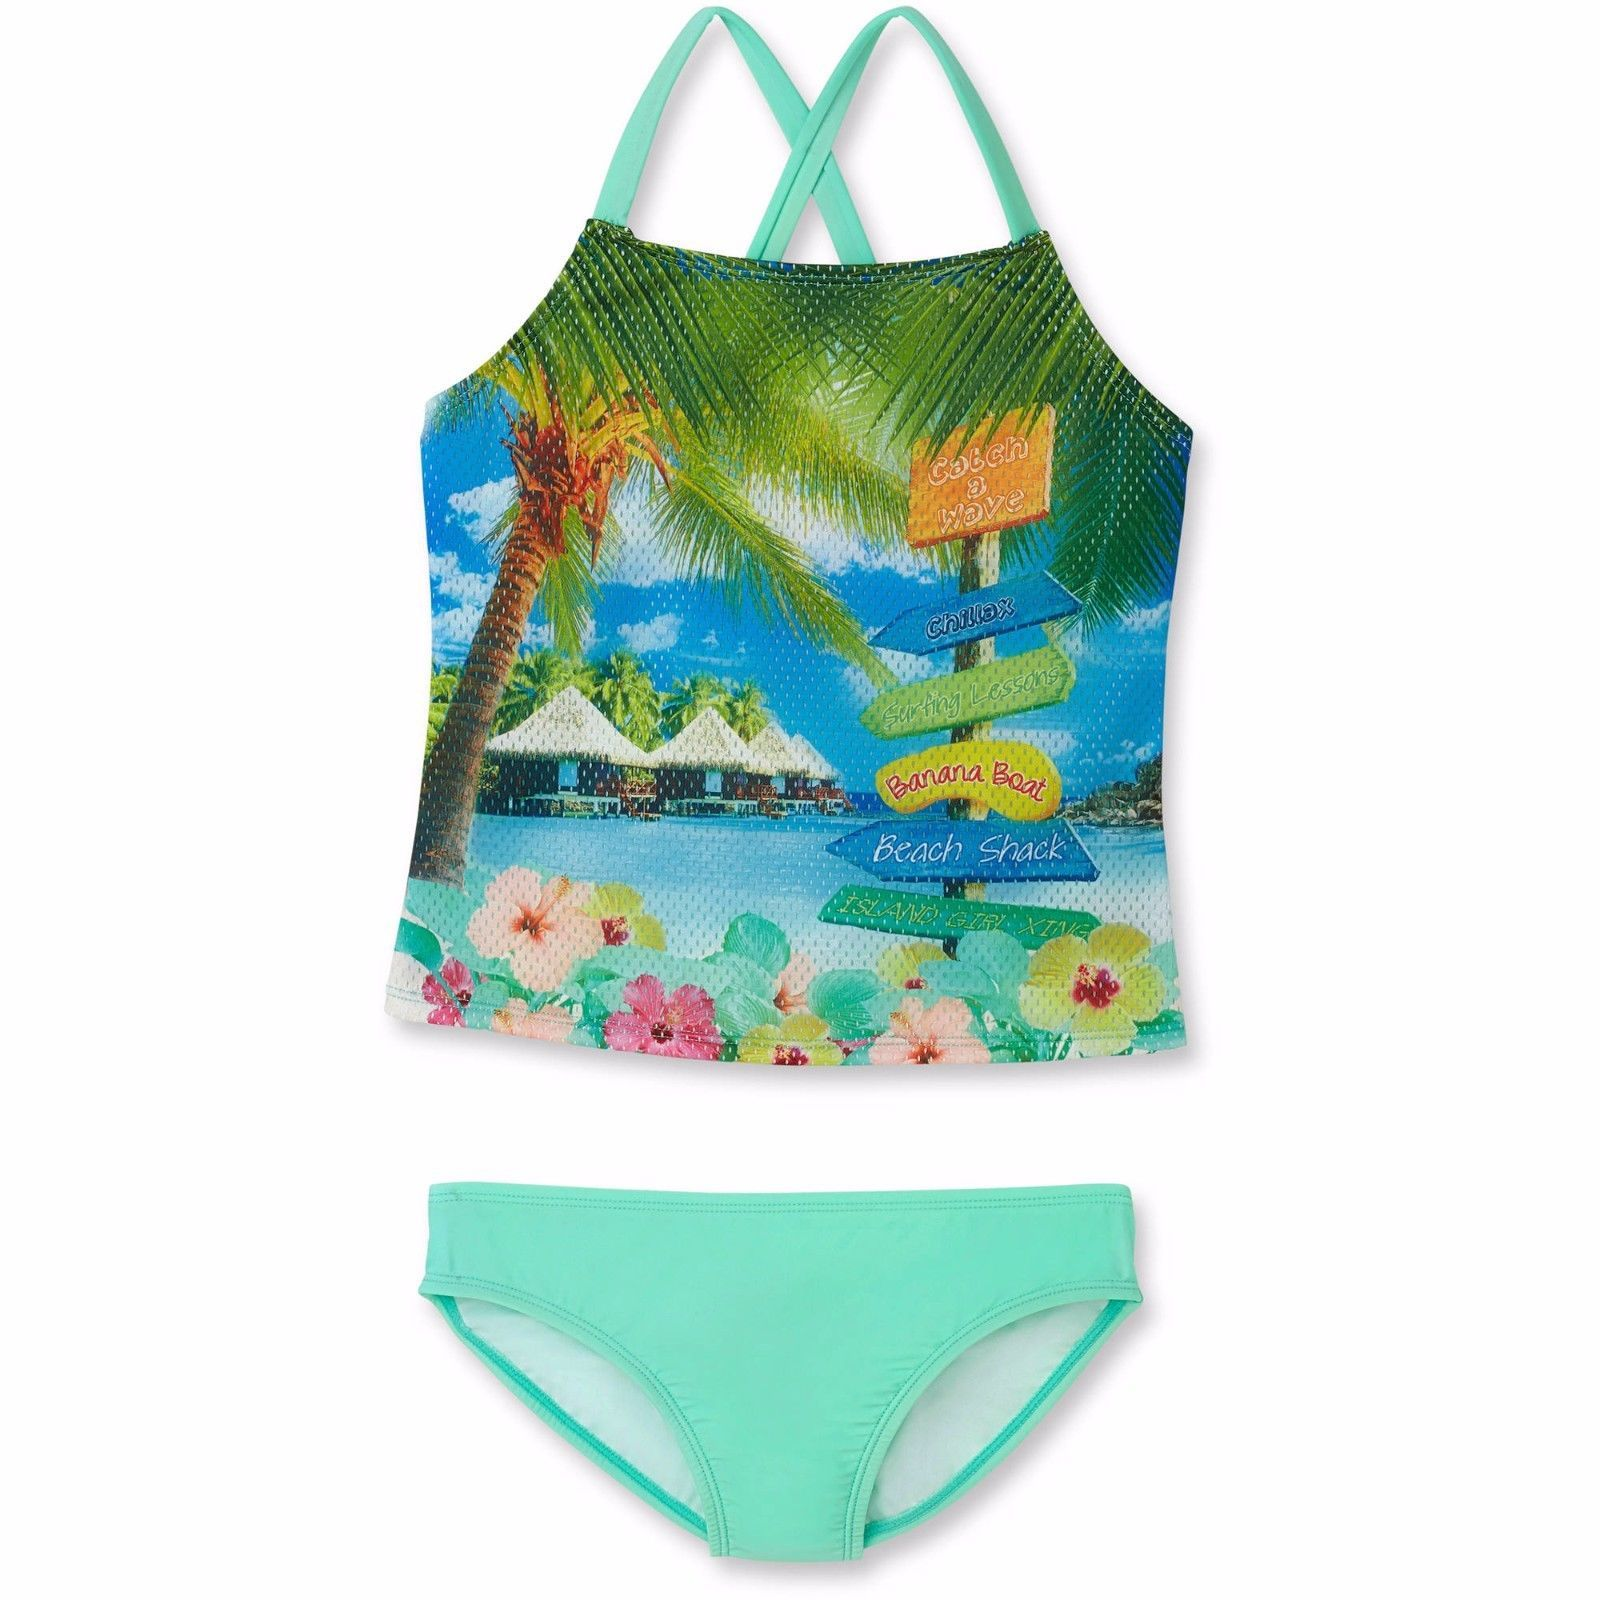 50d25fab26c5 Ocean Pacific Girls 2 Piece Swim Tankini Set and similar items. 57